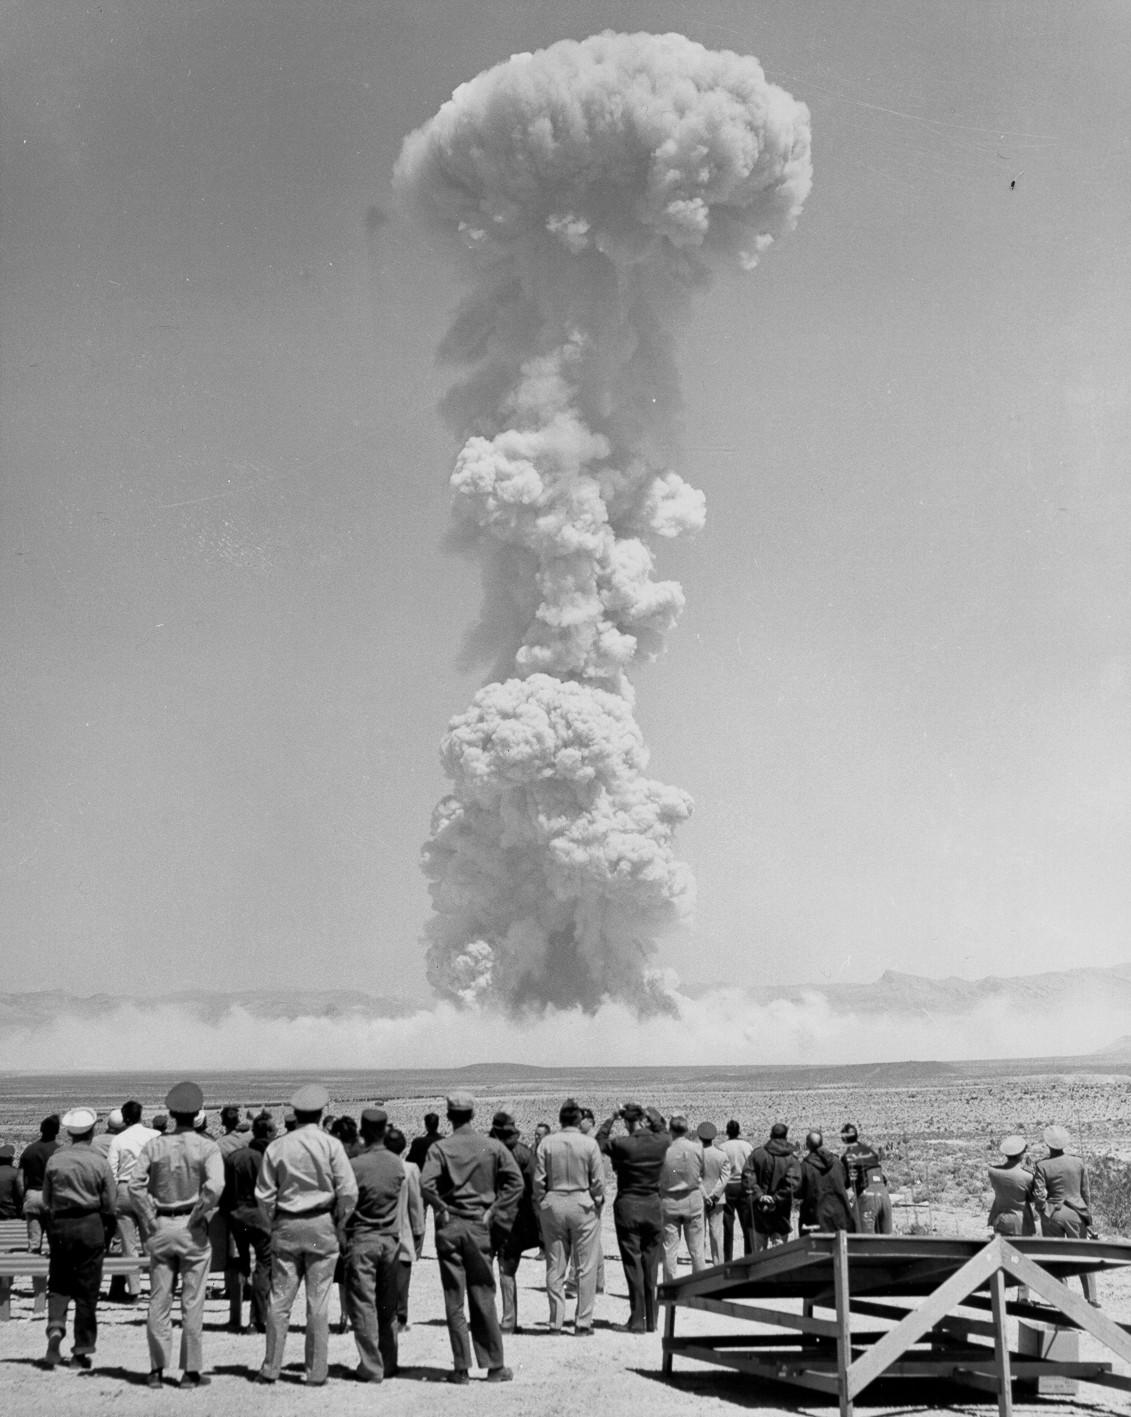 http://travelingringo.com/wp-content/uploads/2011/11/atomic-bomb-test-1955.jpg